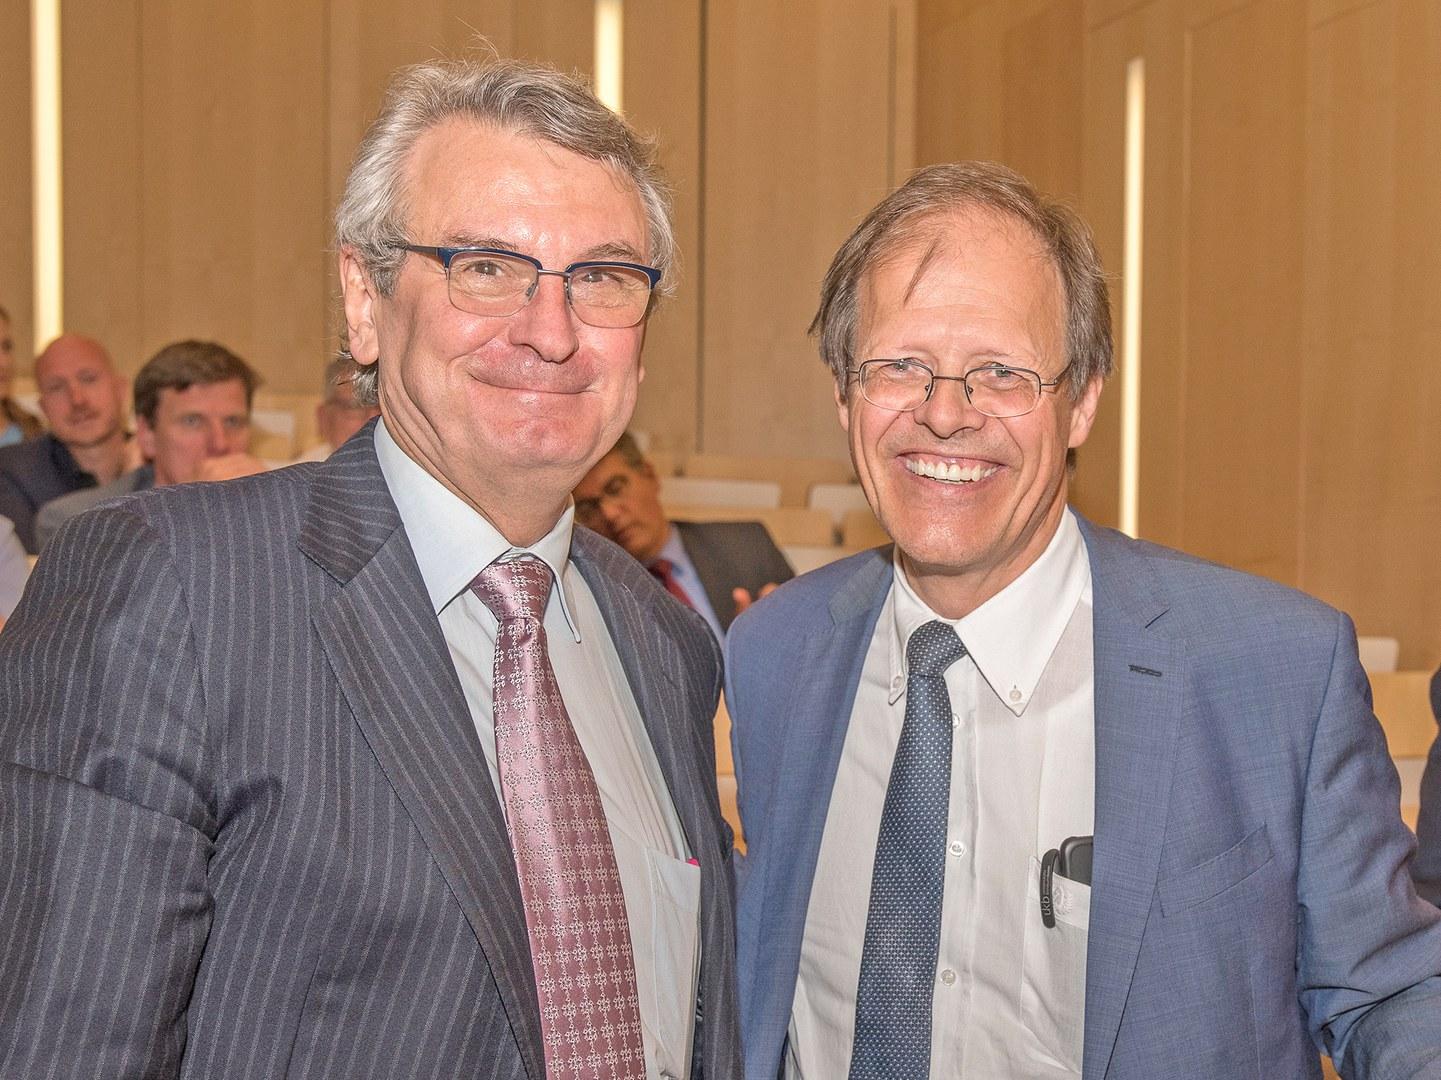 Langjähriger Chef-Radiologe tritt in den Ruhestand: